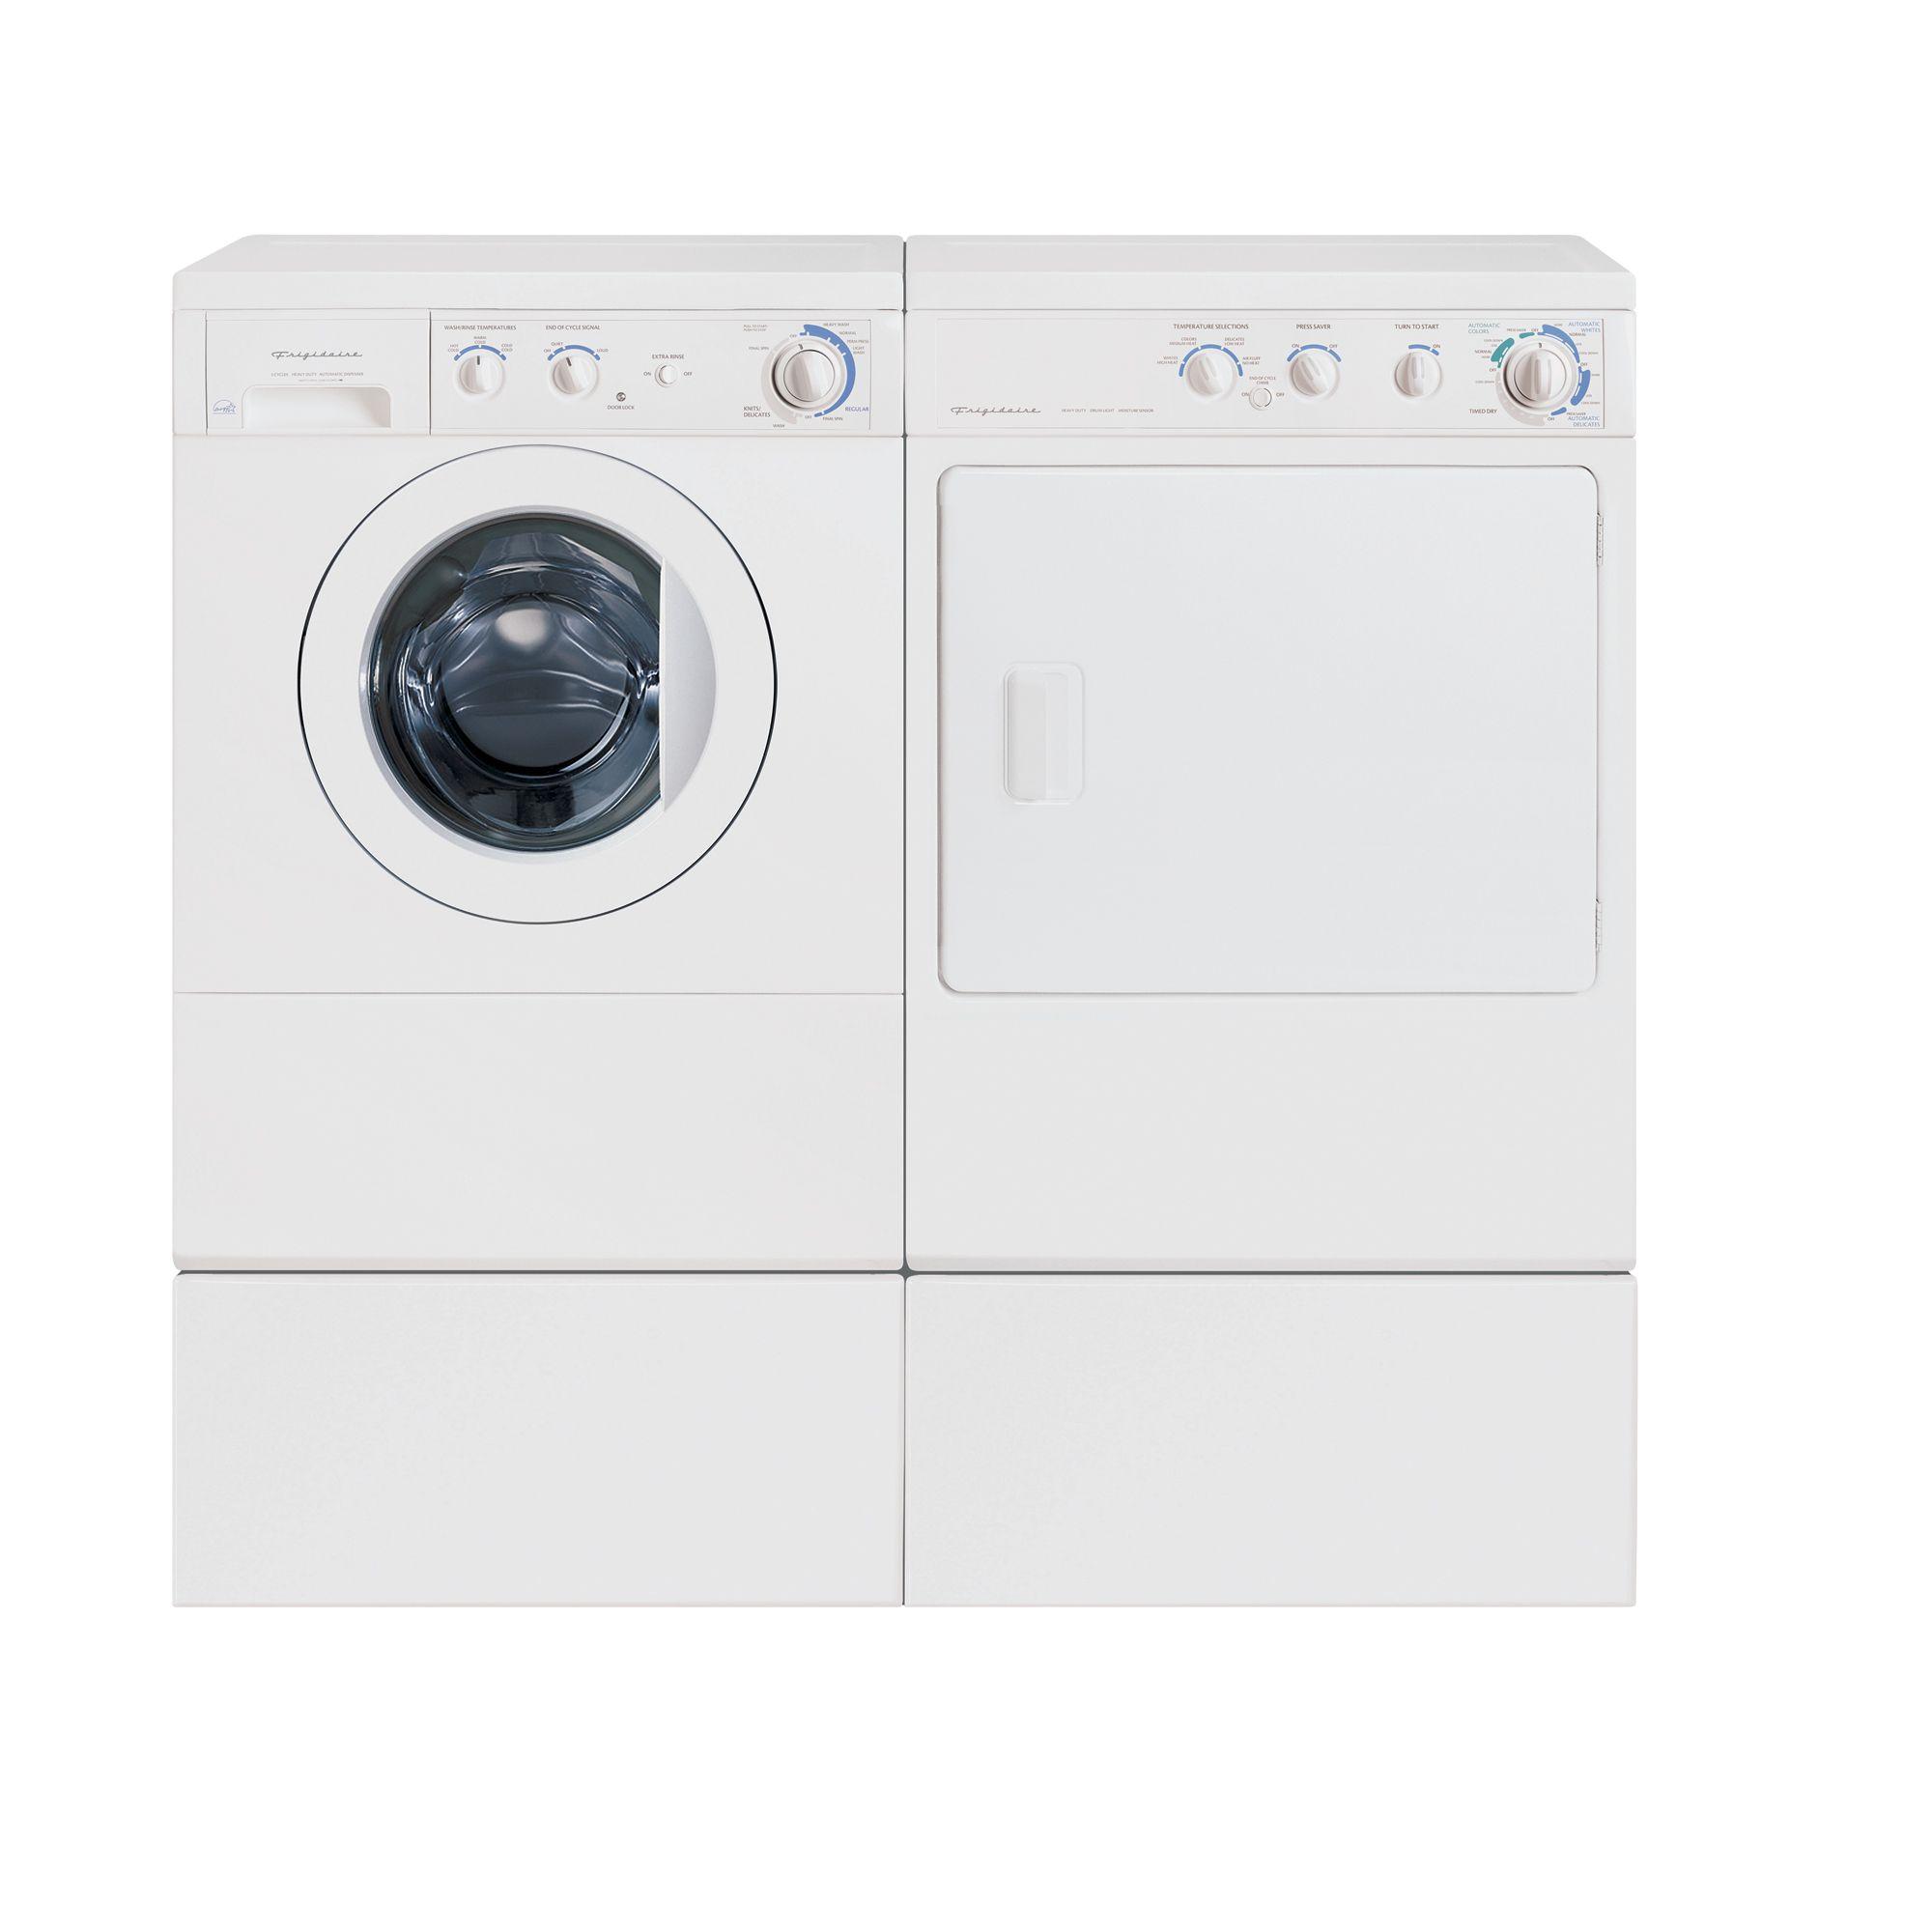 Frigidaire 15 in. Riser Laundry Pedestal